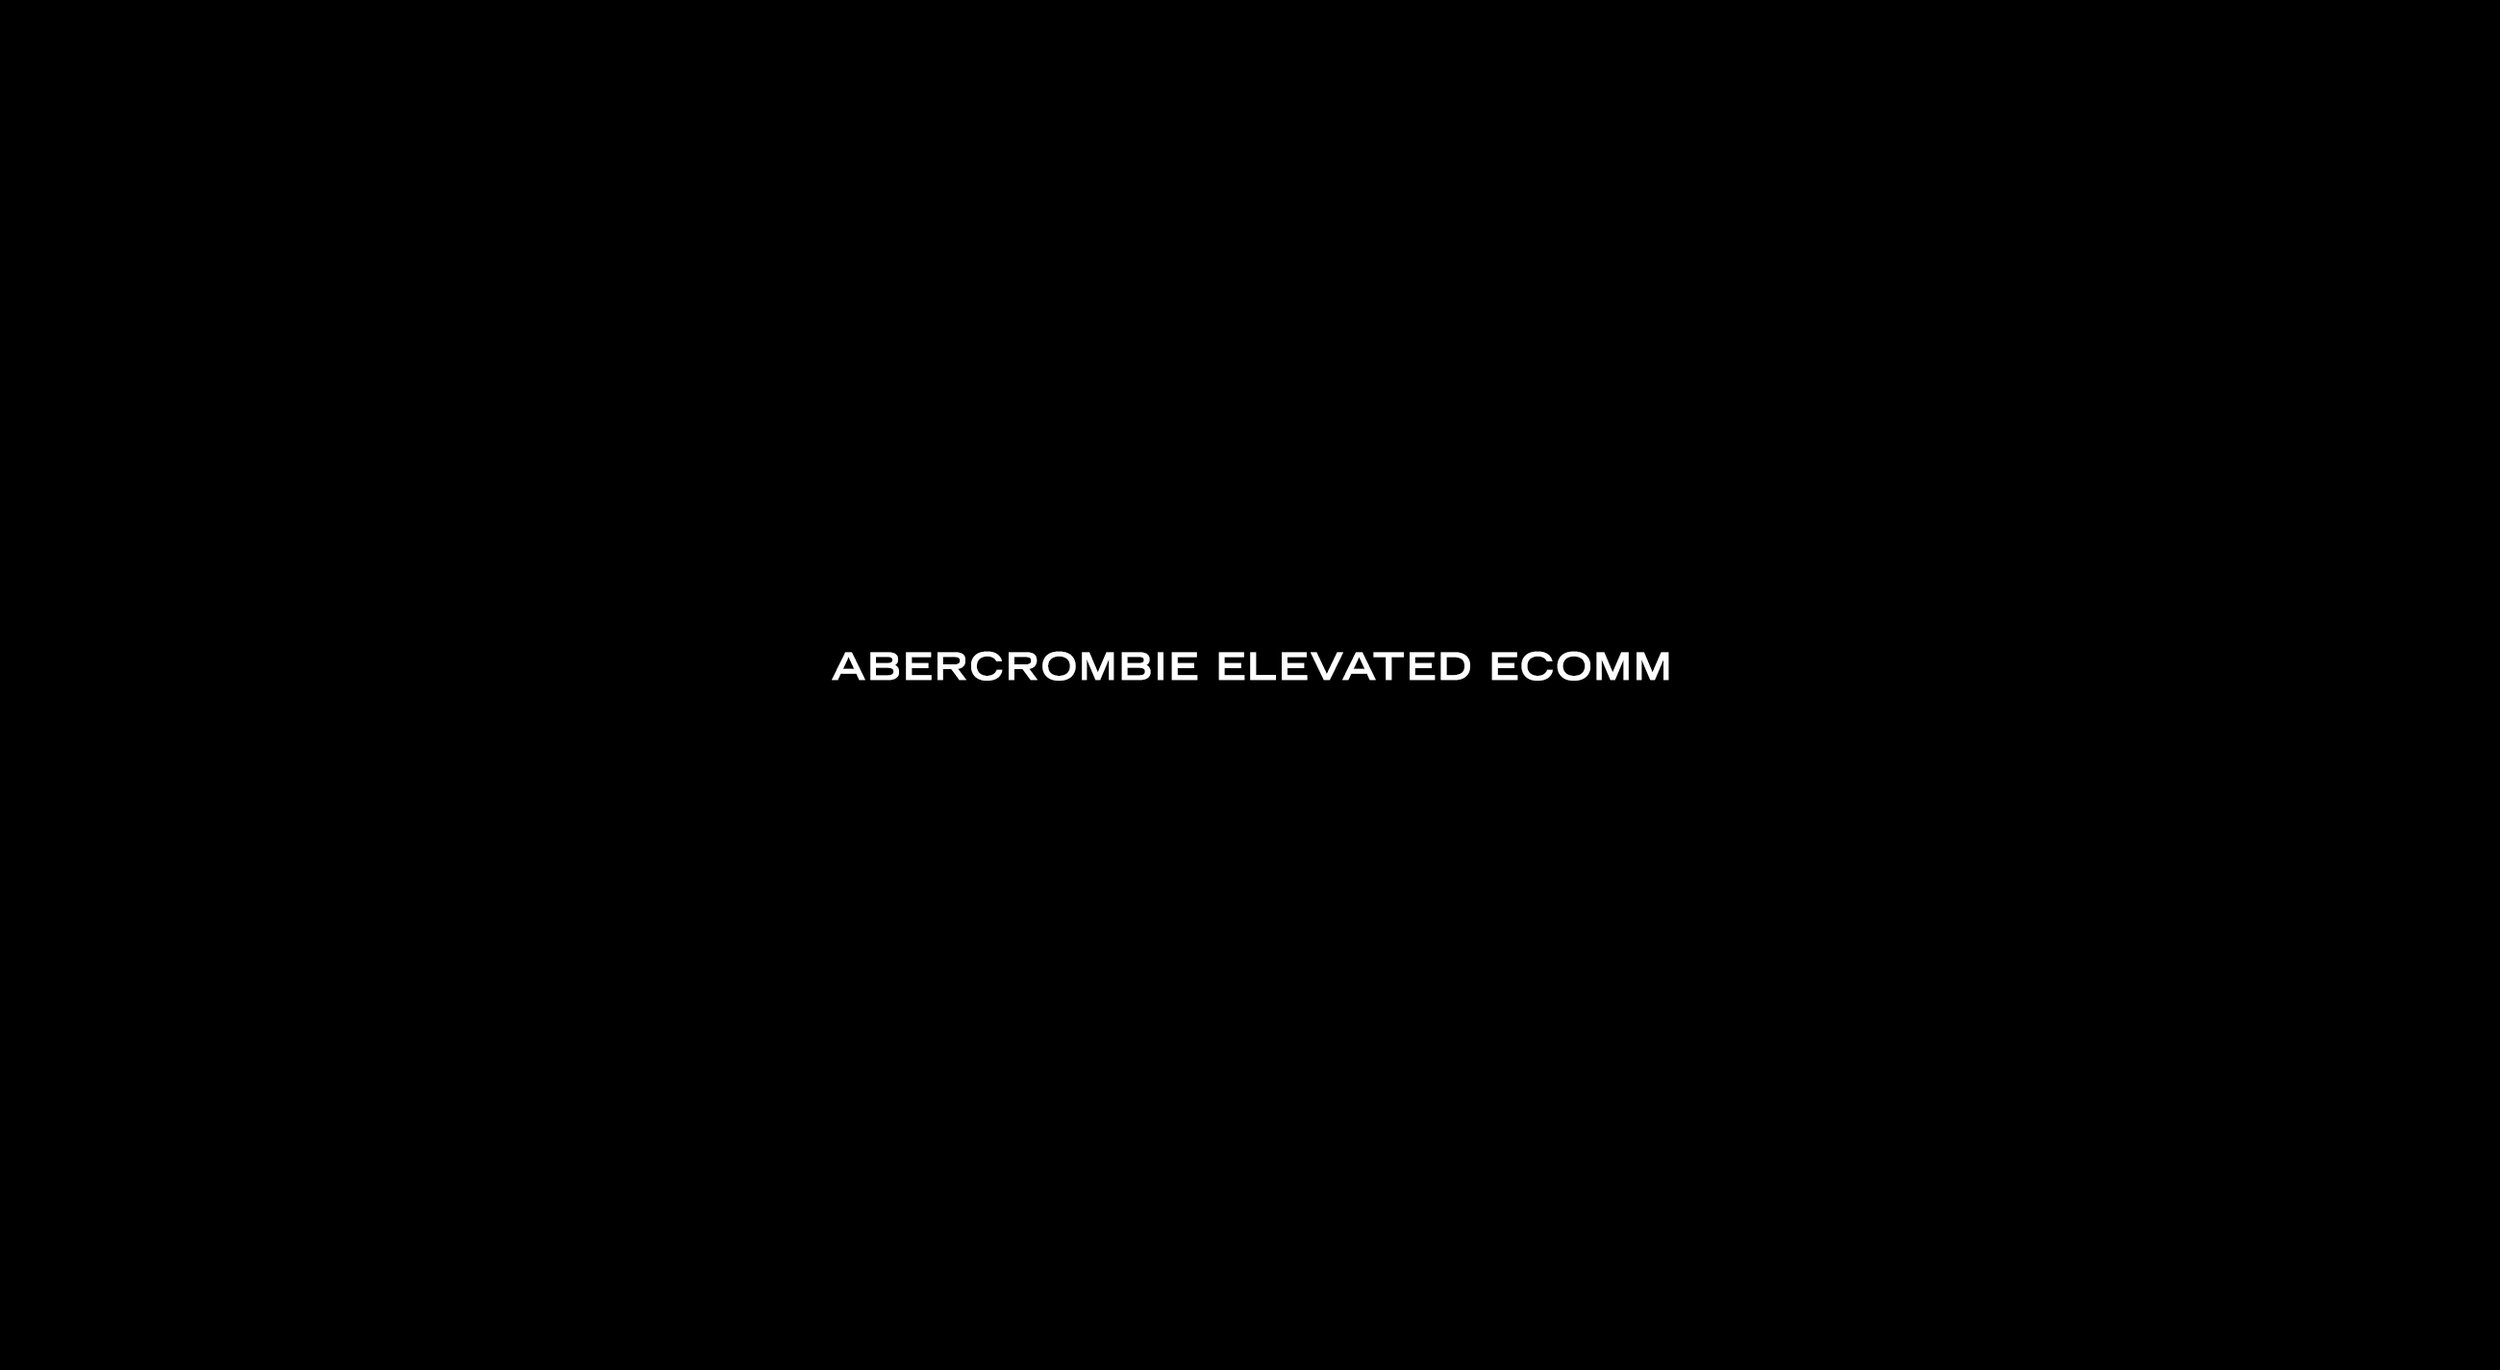 Abercrombie_ElevatedEcomm_Header.jpg